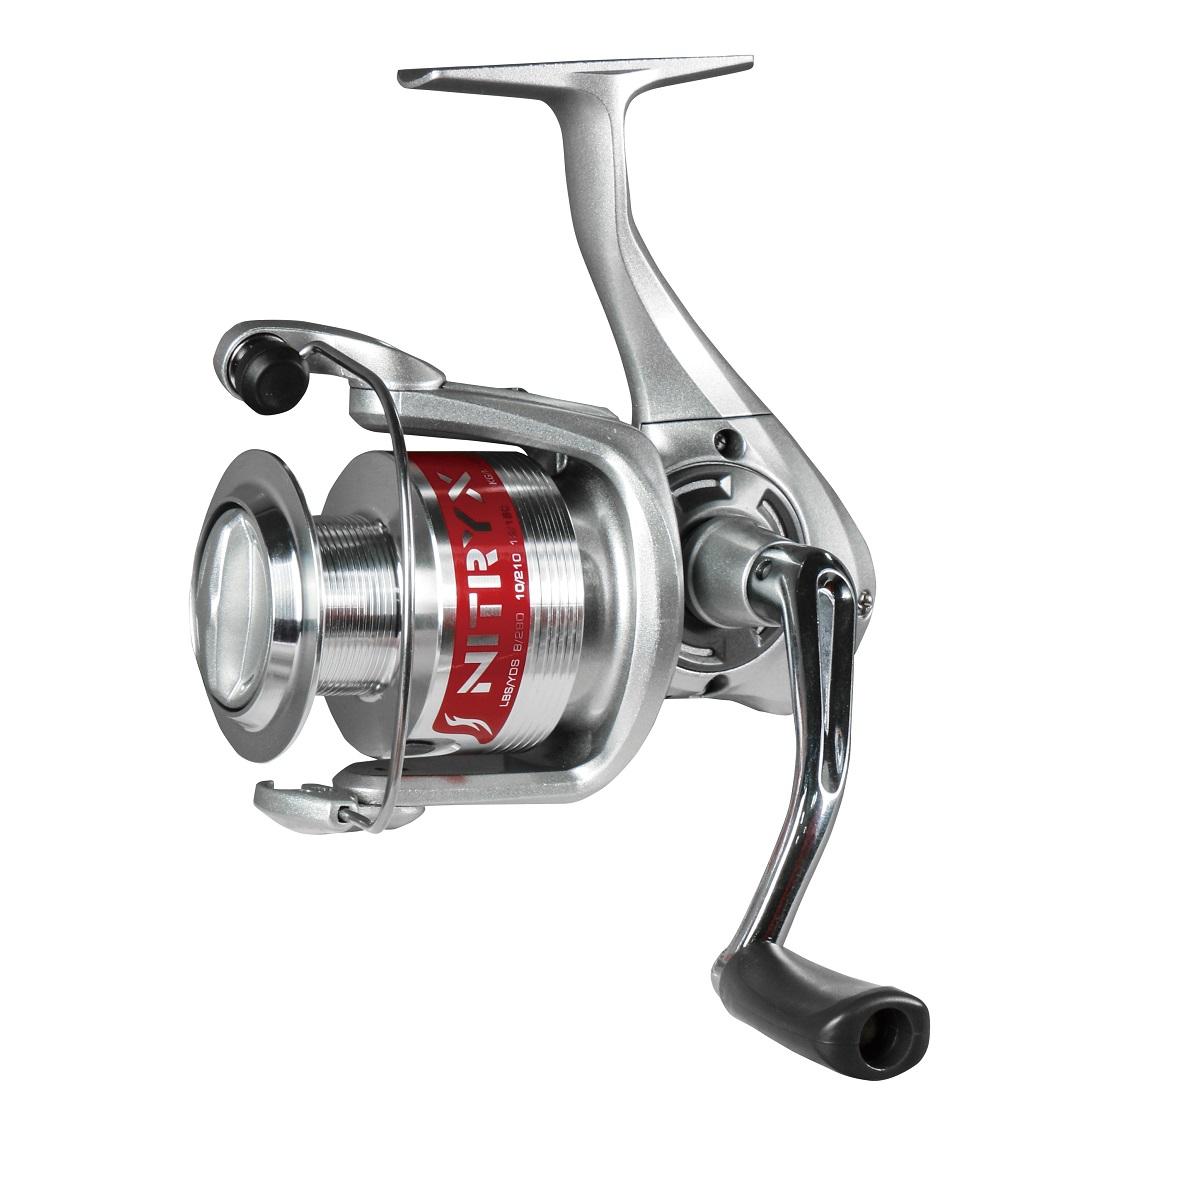 Fishing rods and reels nitryx spinning reel manufacturer for Okuma fishing reels